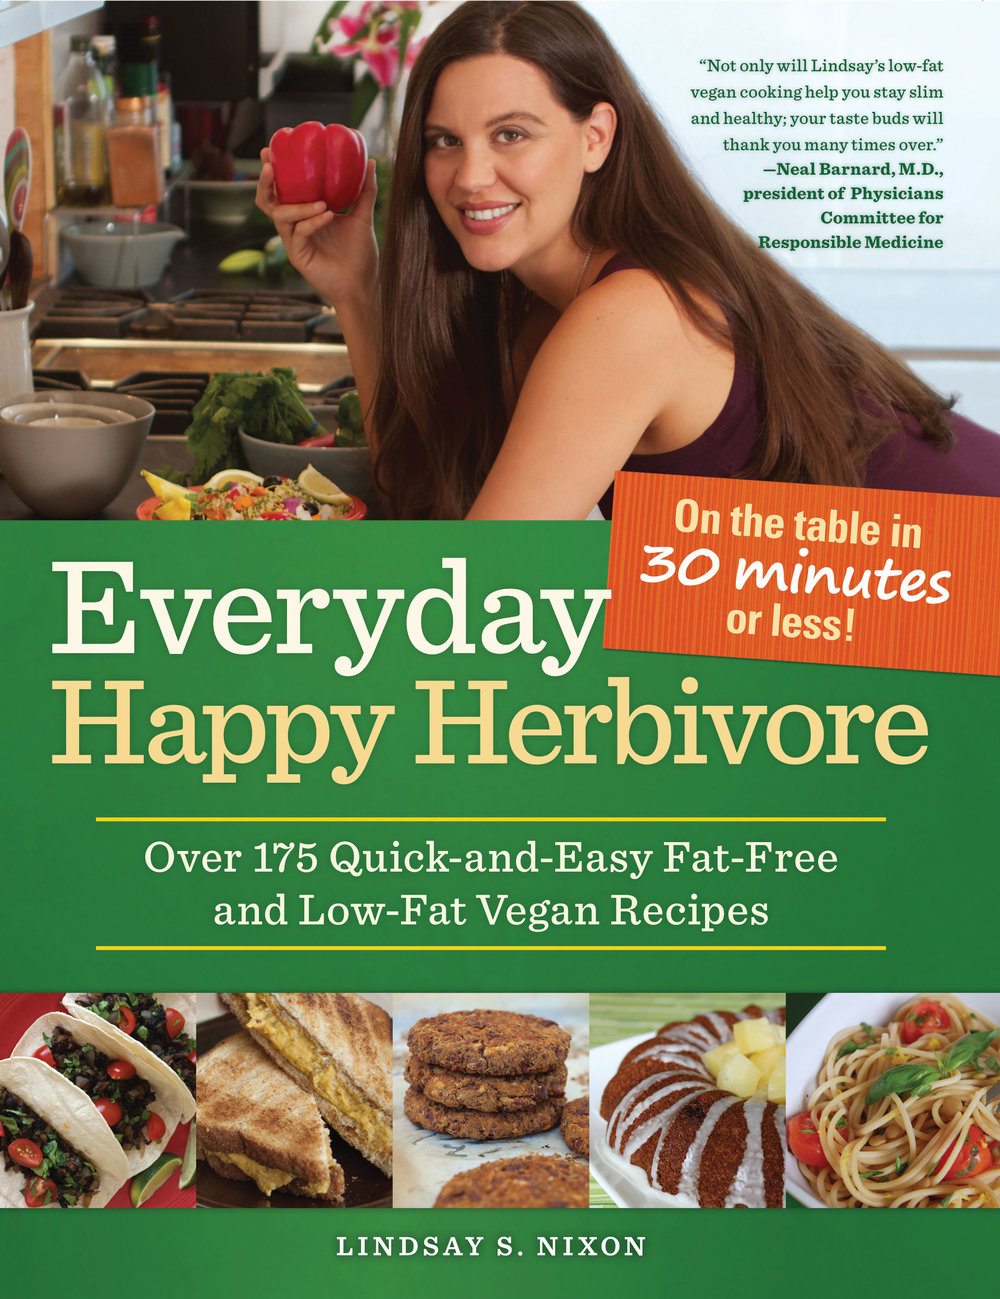 Everyday Happy Herbivore by Lindsay Nixon